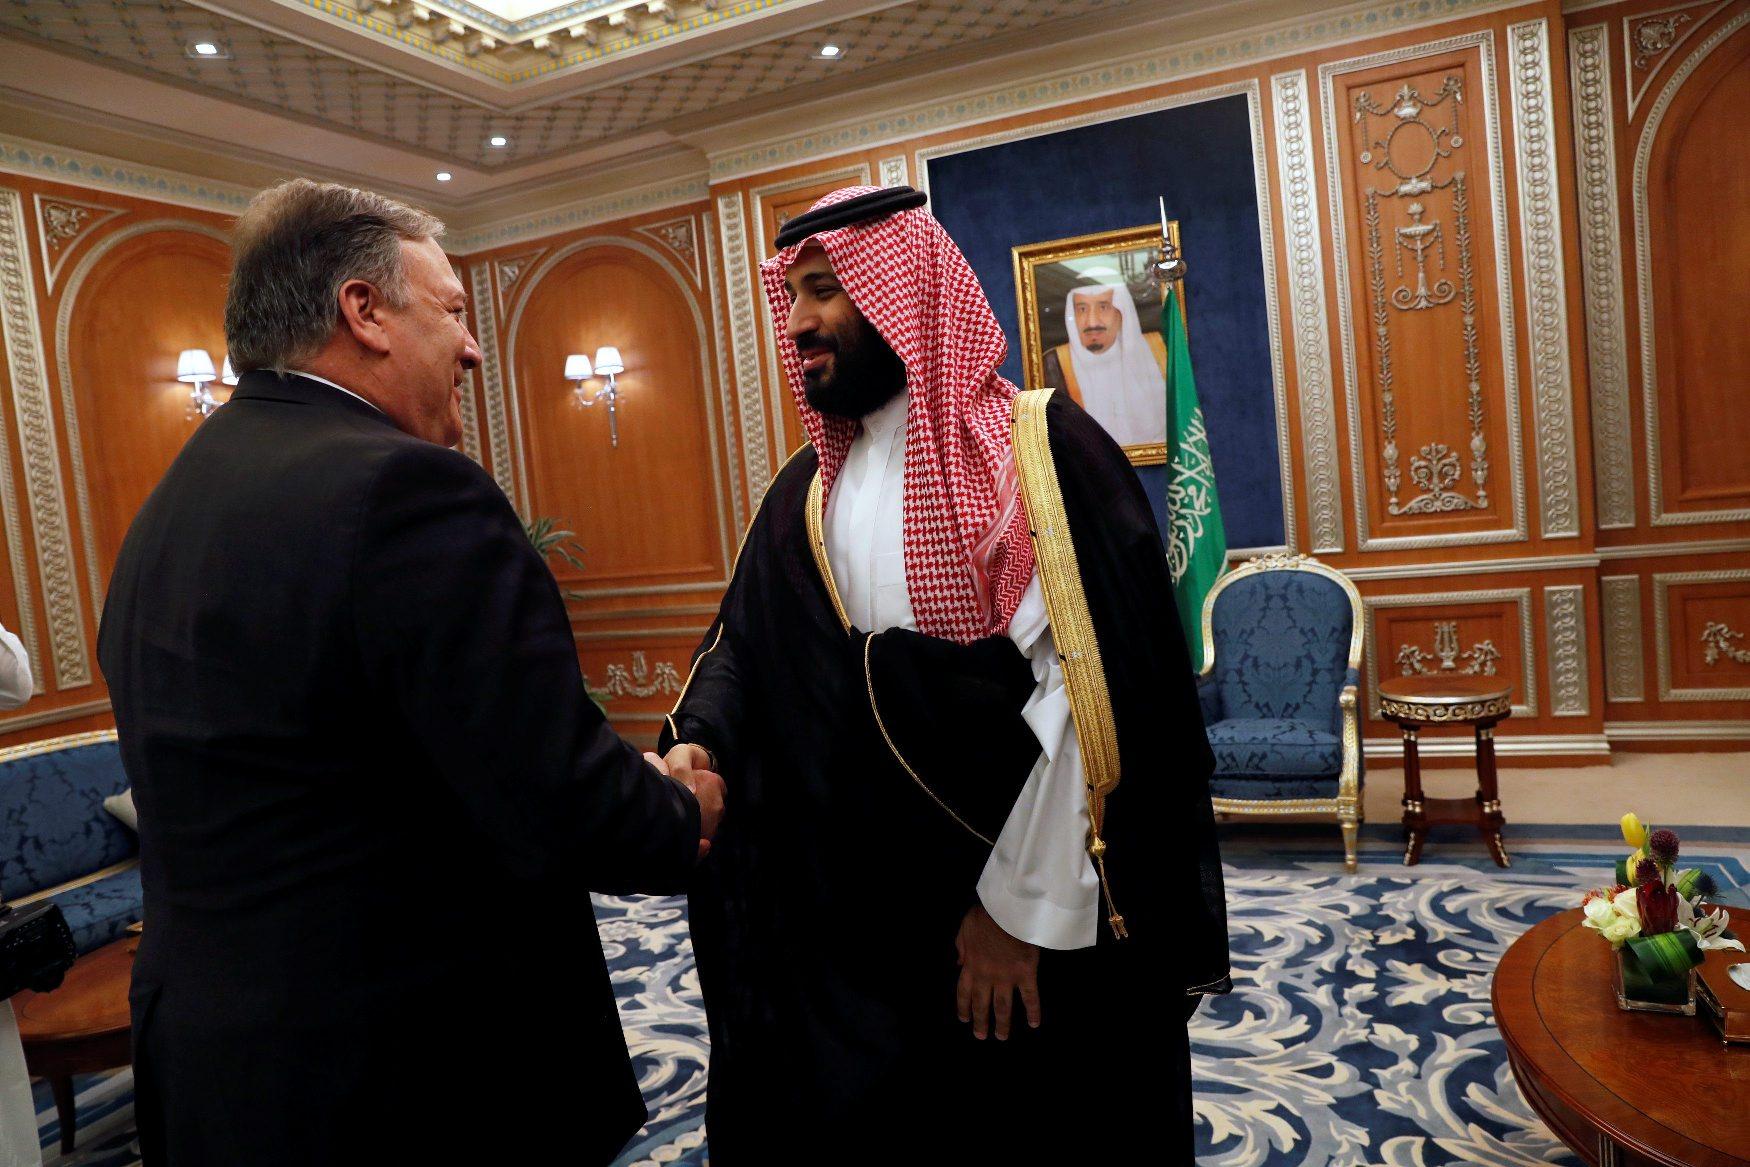 U.S. Secretary of State Mike Pompeo meets with the Saudi Crown Prince Mohammed bin Salman during his visits in Riyadh, Saudi Arabia, October 16, 2018. REUTERS/Leah Millis/Pool